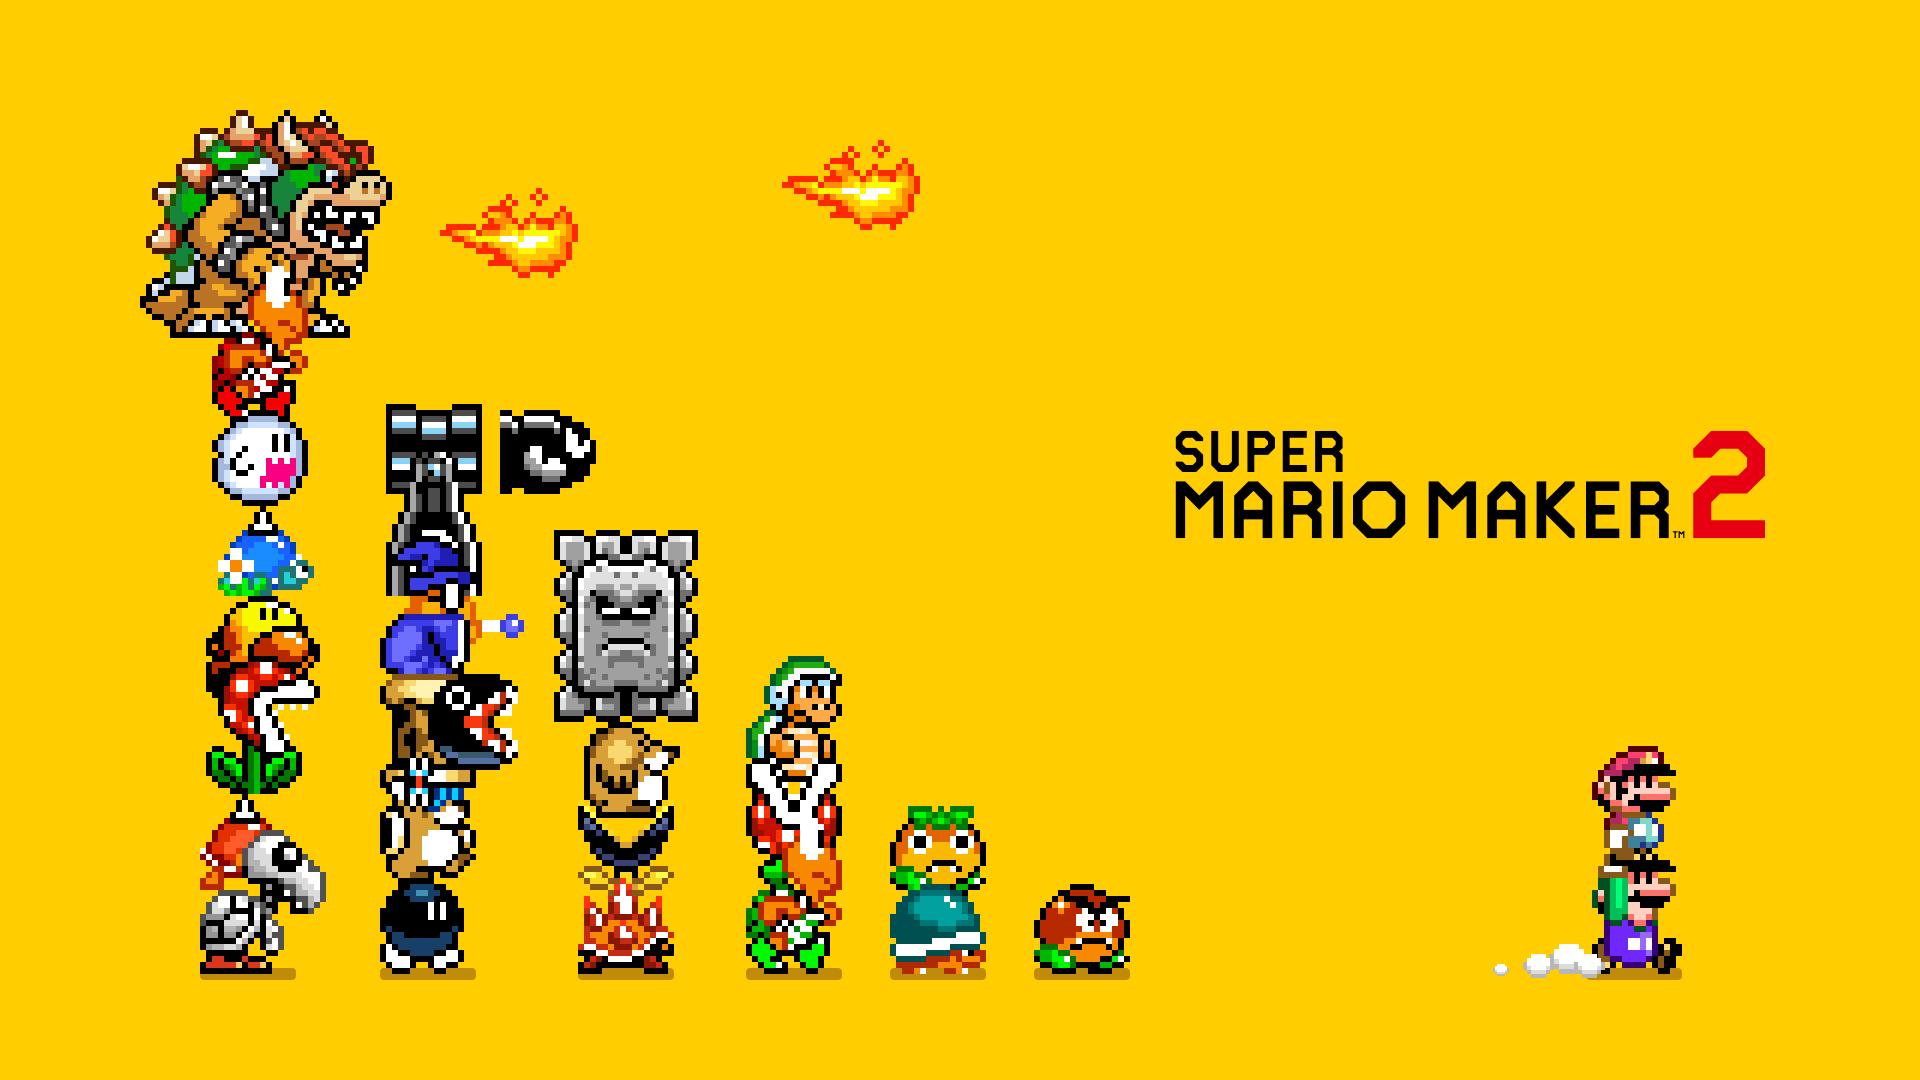 SMM2_My_Nintendo_wallpaper_A_desktop.jpg